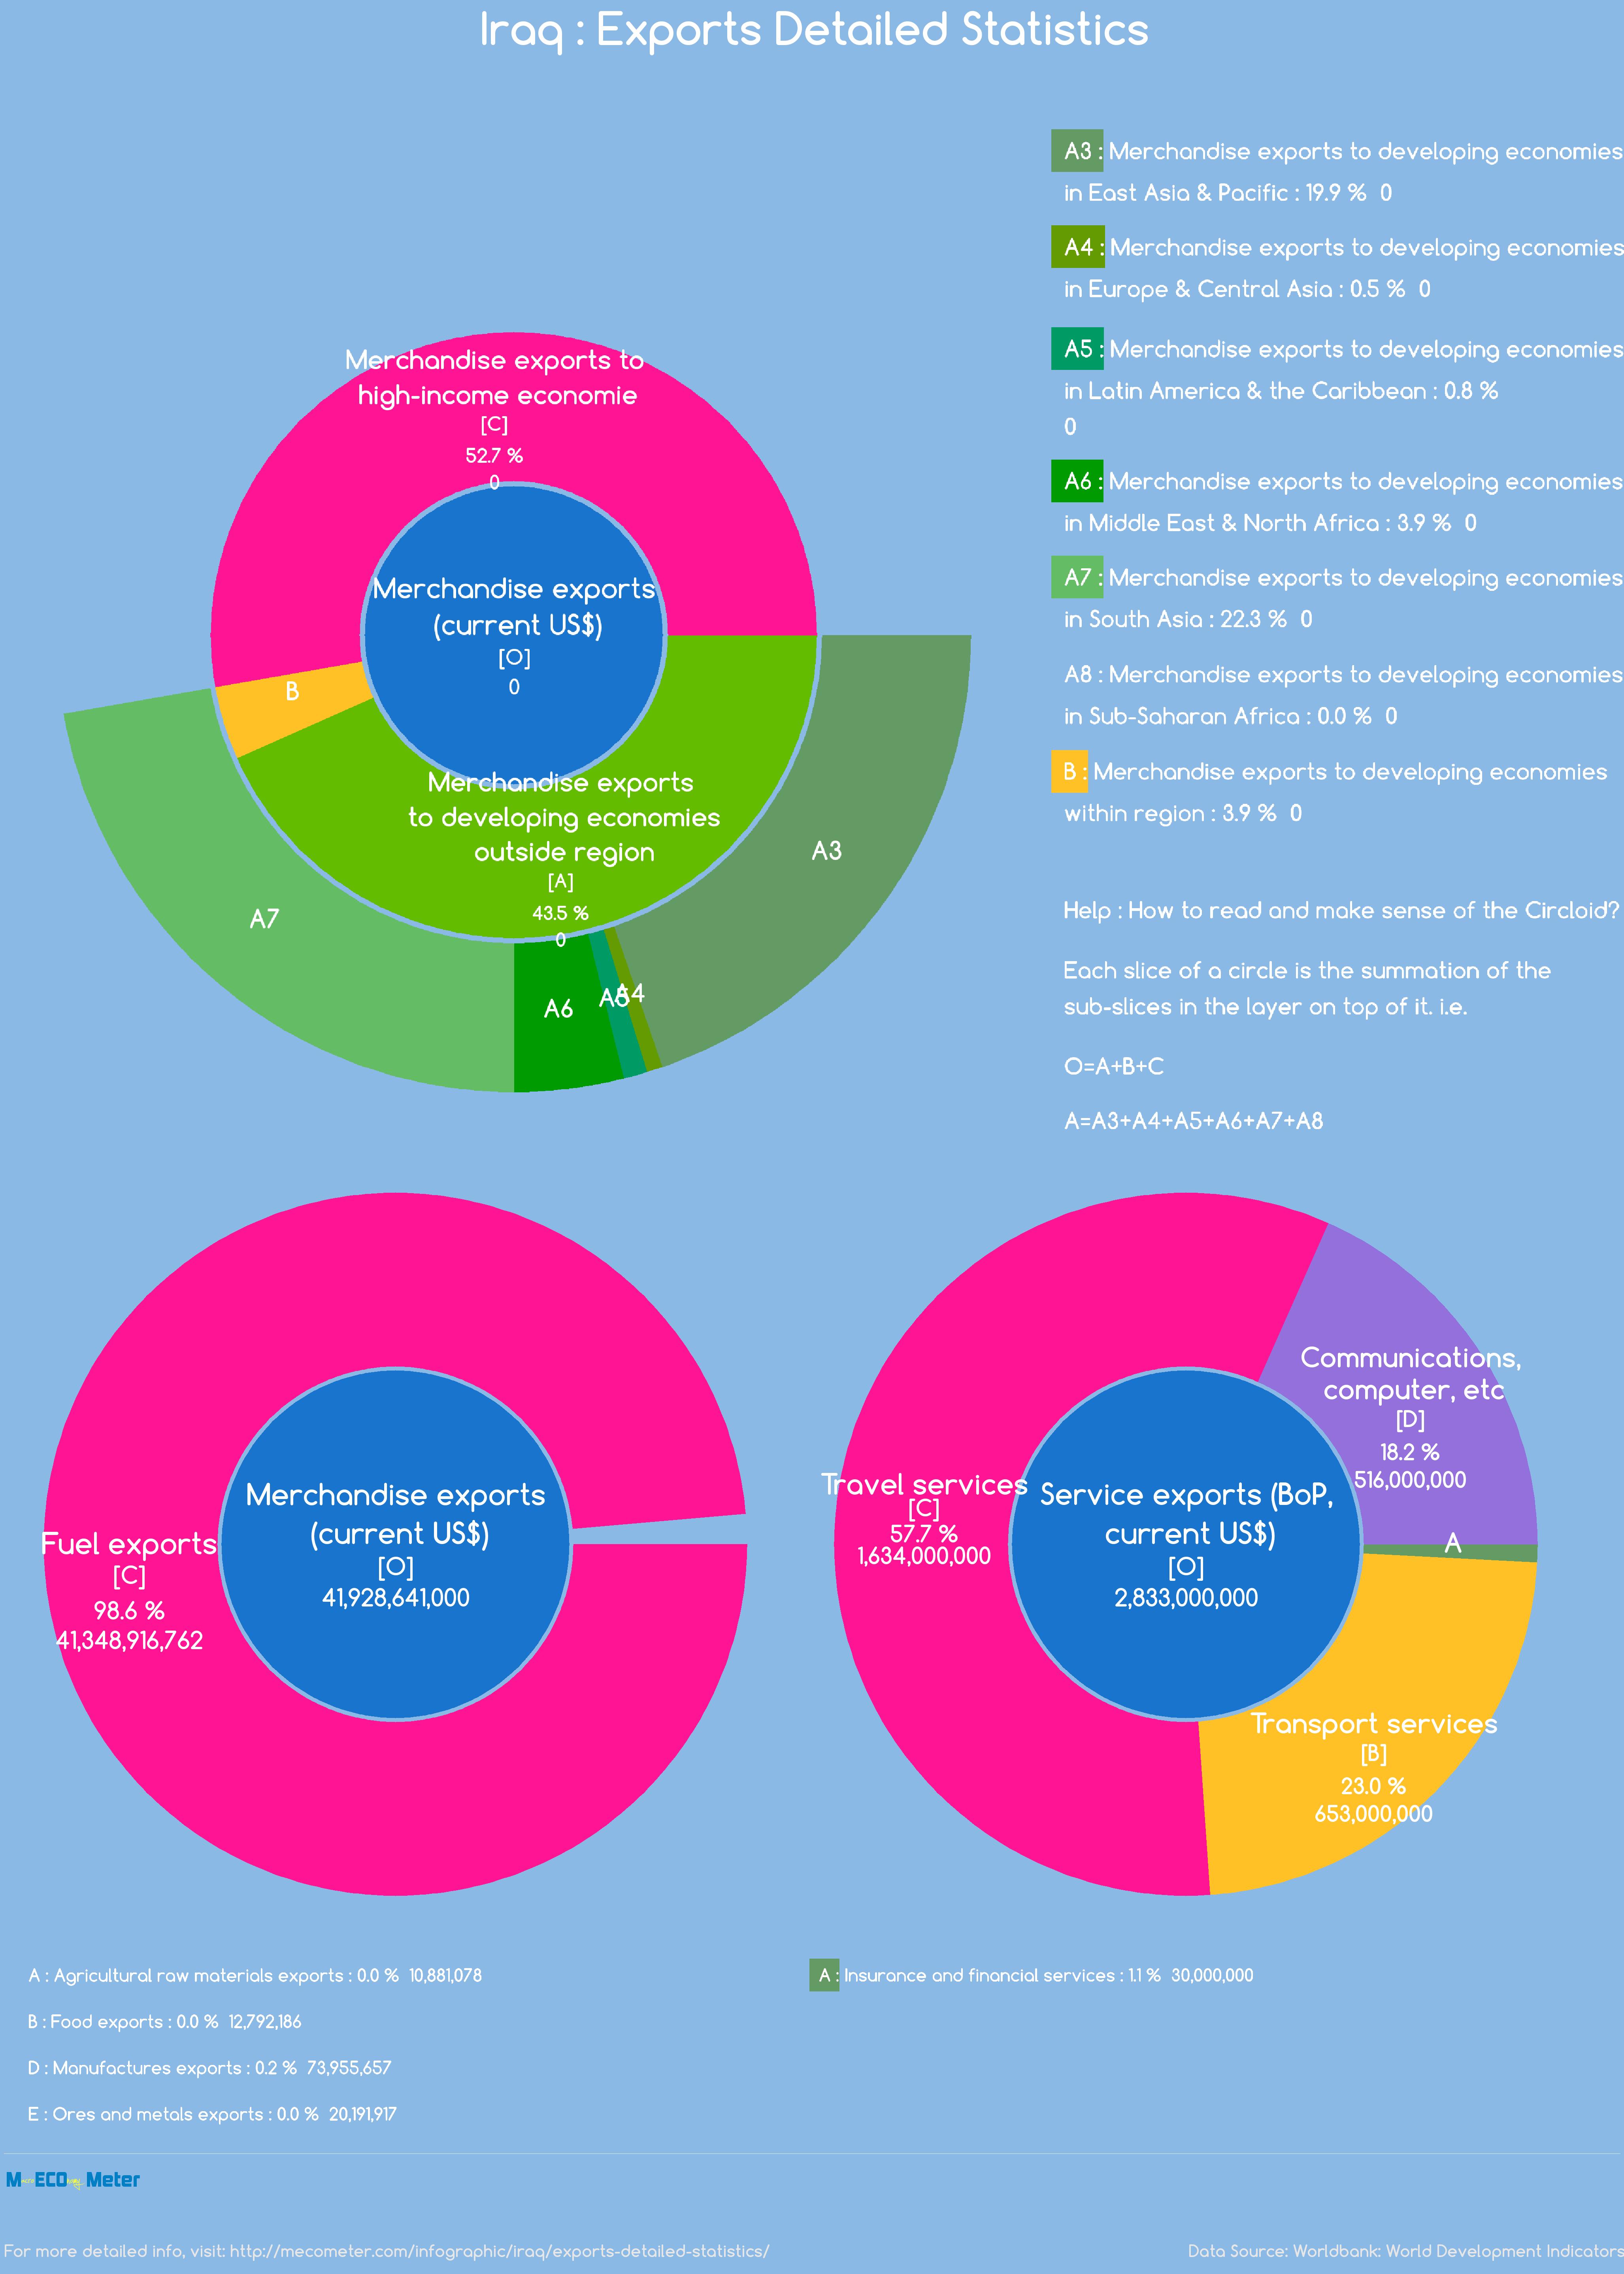 Iraq : Exports Detailed Statistics